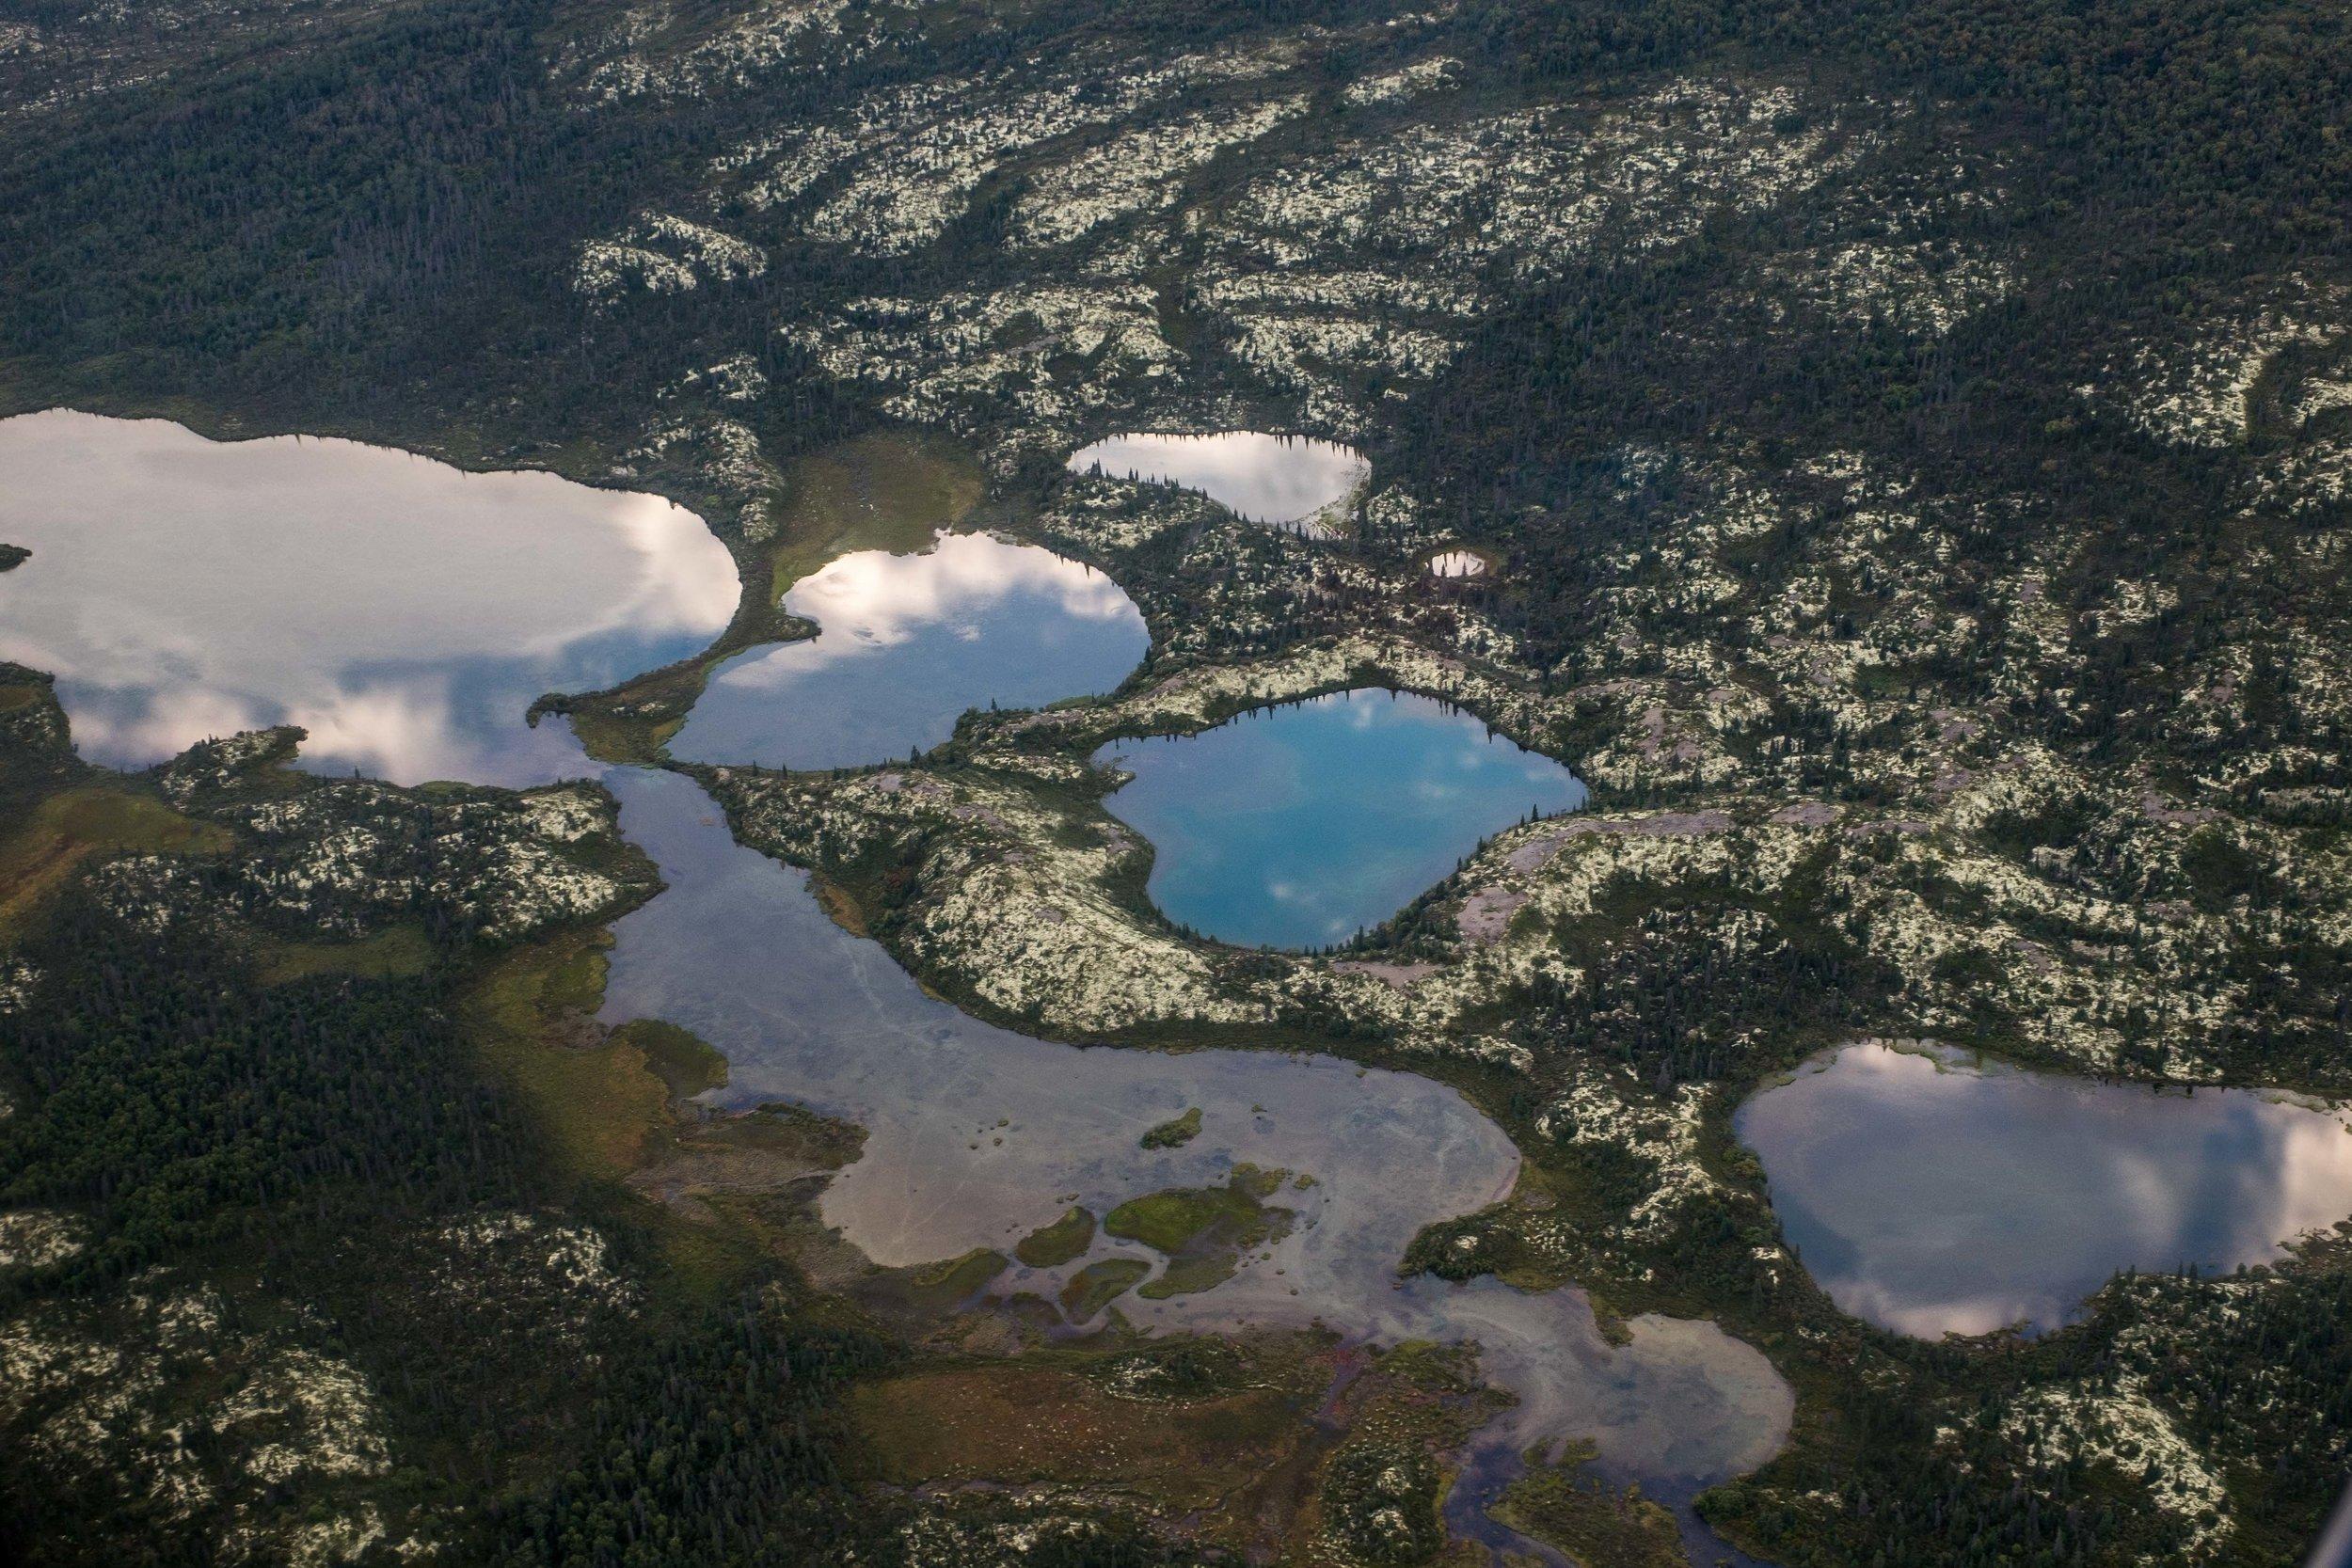 20160819-JI-Lake Clark National Park-_DSF2716.jpg